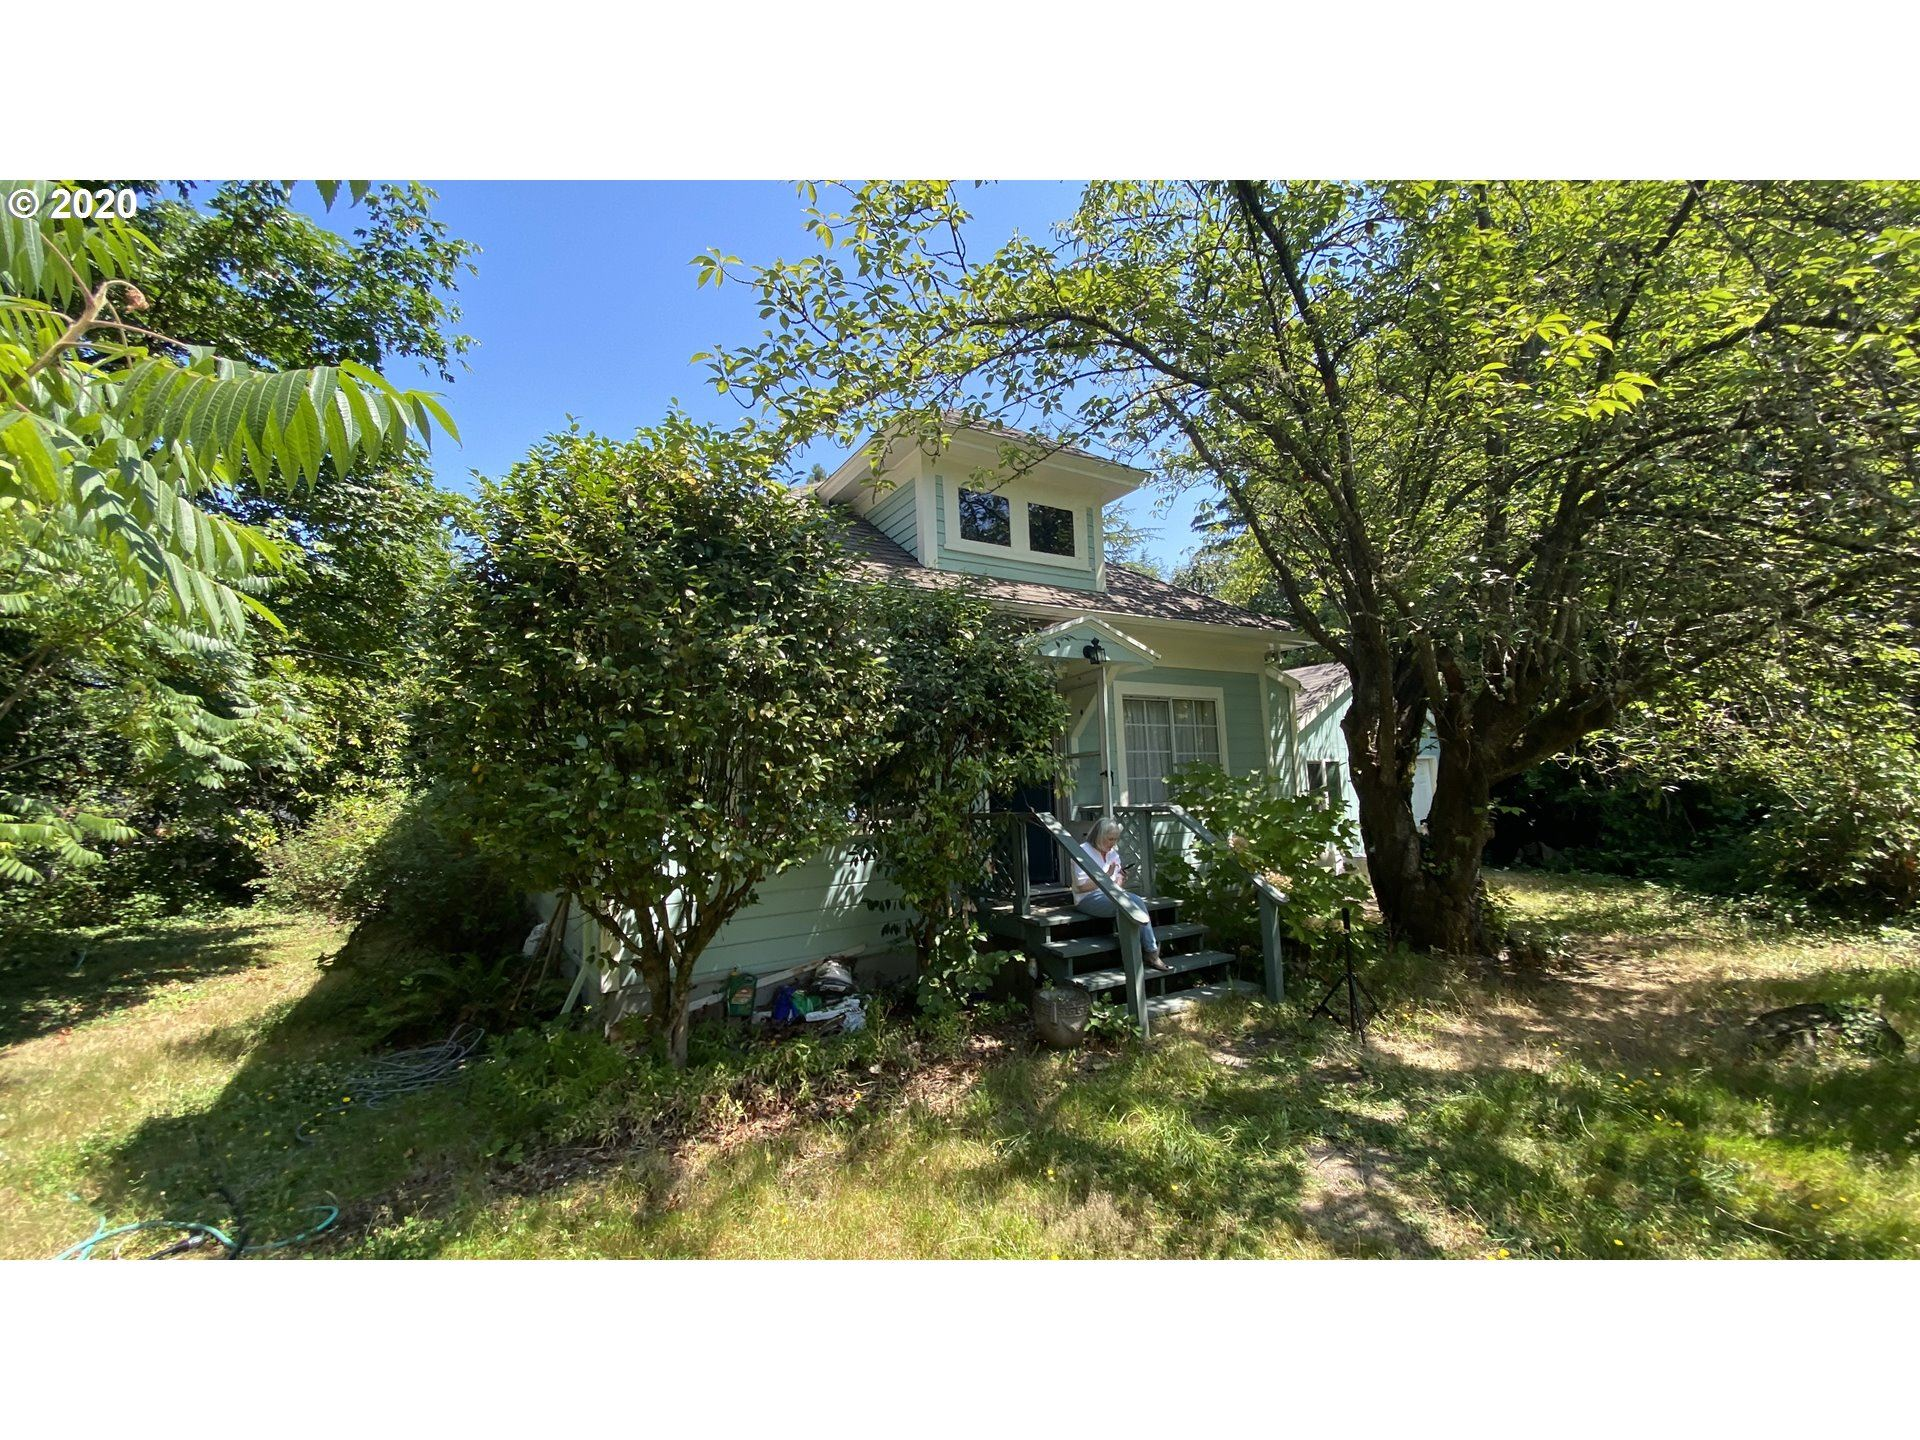 5400 SW SHATTUCK RD, Portland, OR 97221 - MLS#: 20627716